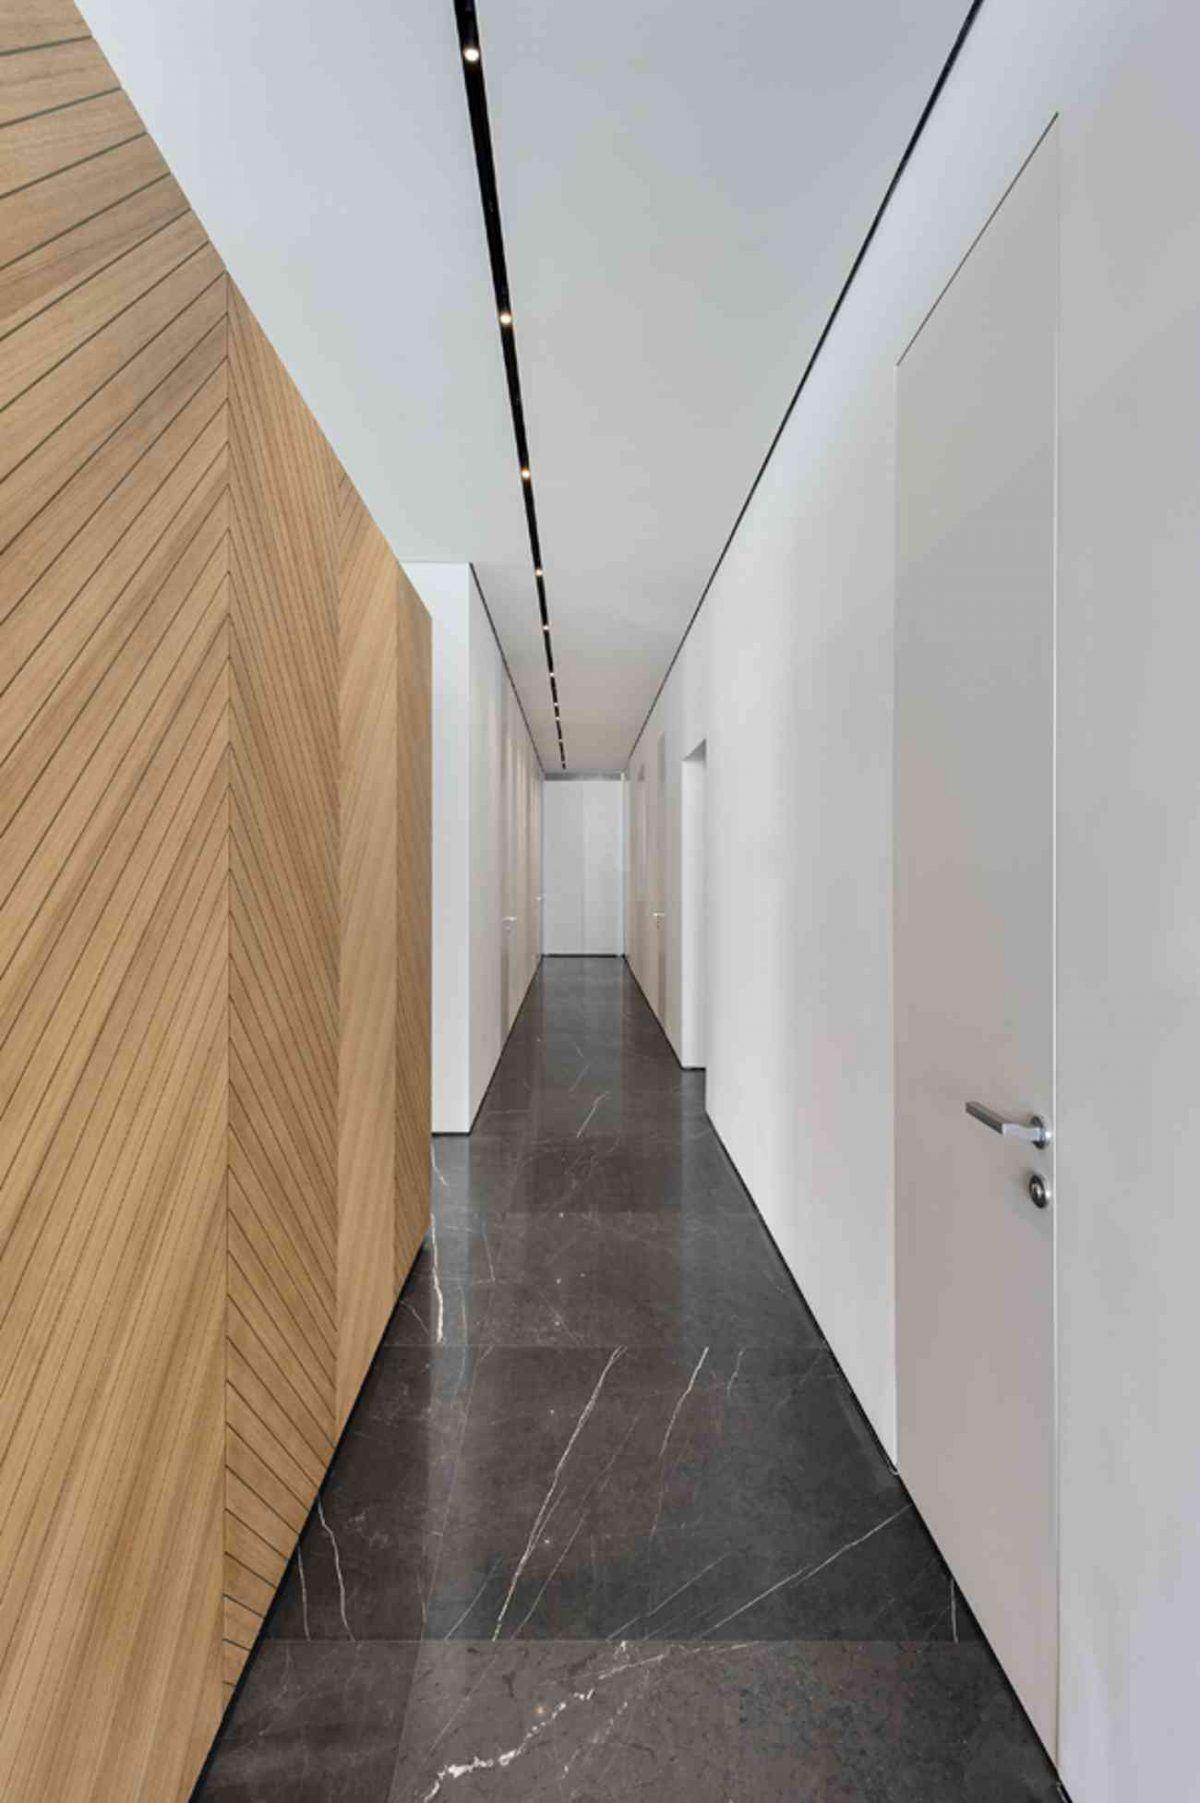 Vista – Netanya גוף תאורה בתקרת מסדרון הכניסה לחדרים על ידי קמחי תאורה